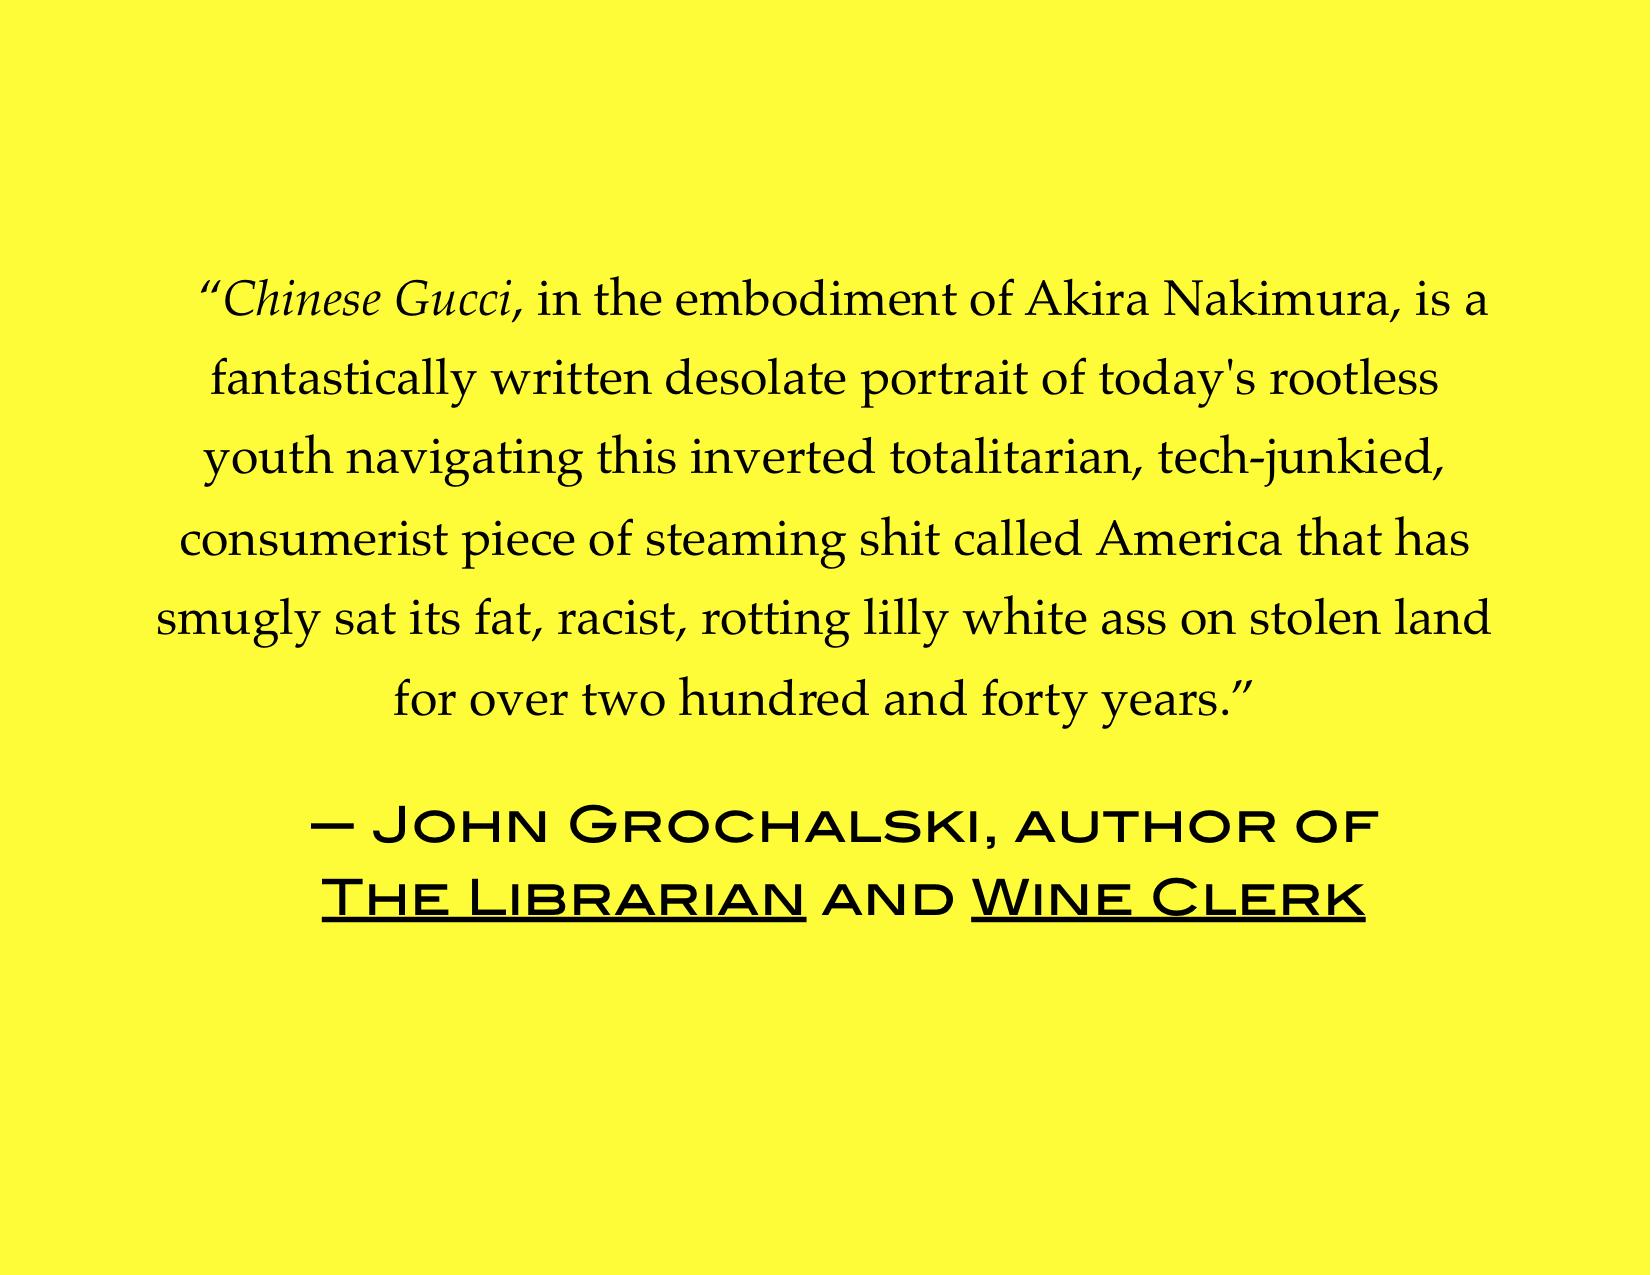 2 Grochalski Blurb.png